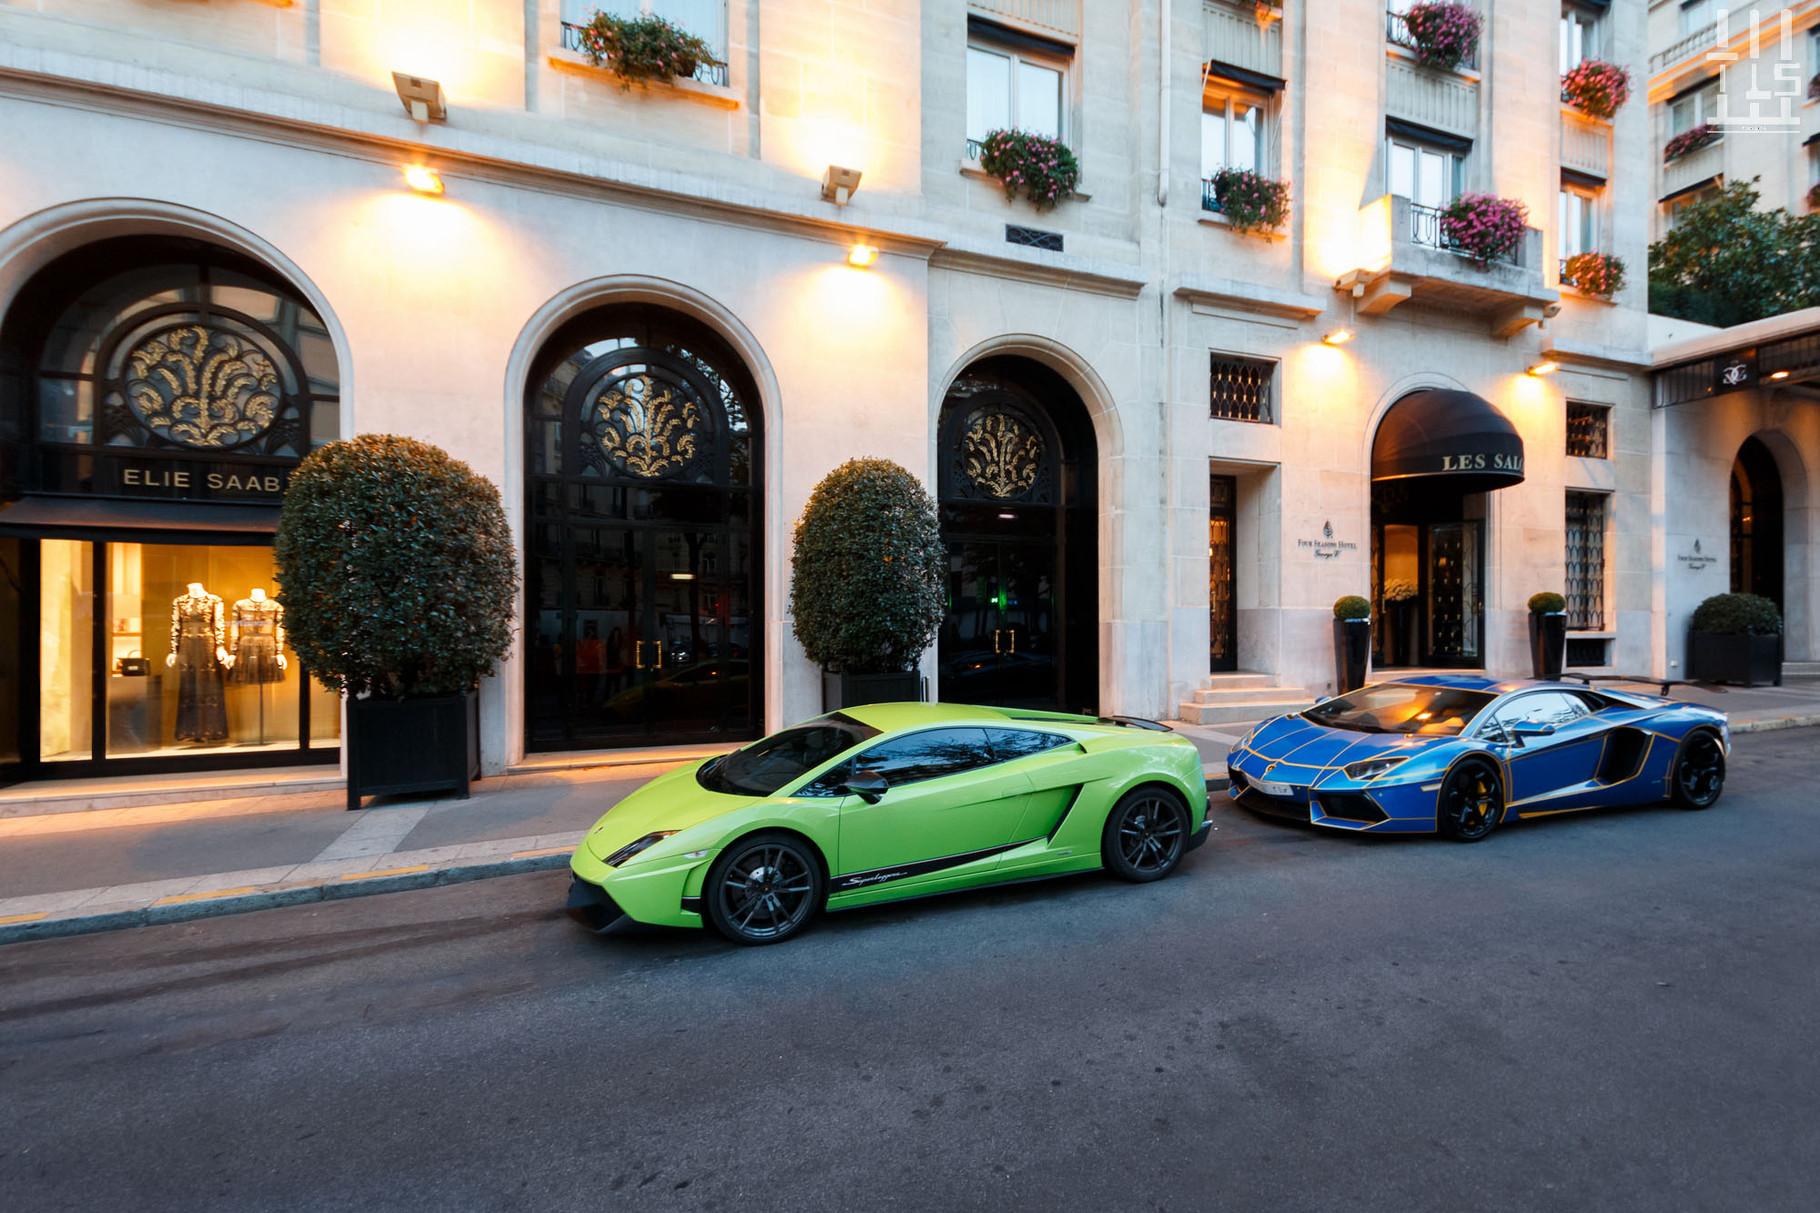 Lamborghini Gallardo LP570-4 Superleggera & Lamborghini Aventador, avenue George V